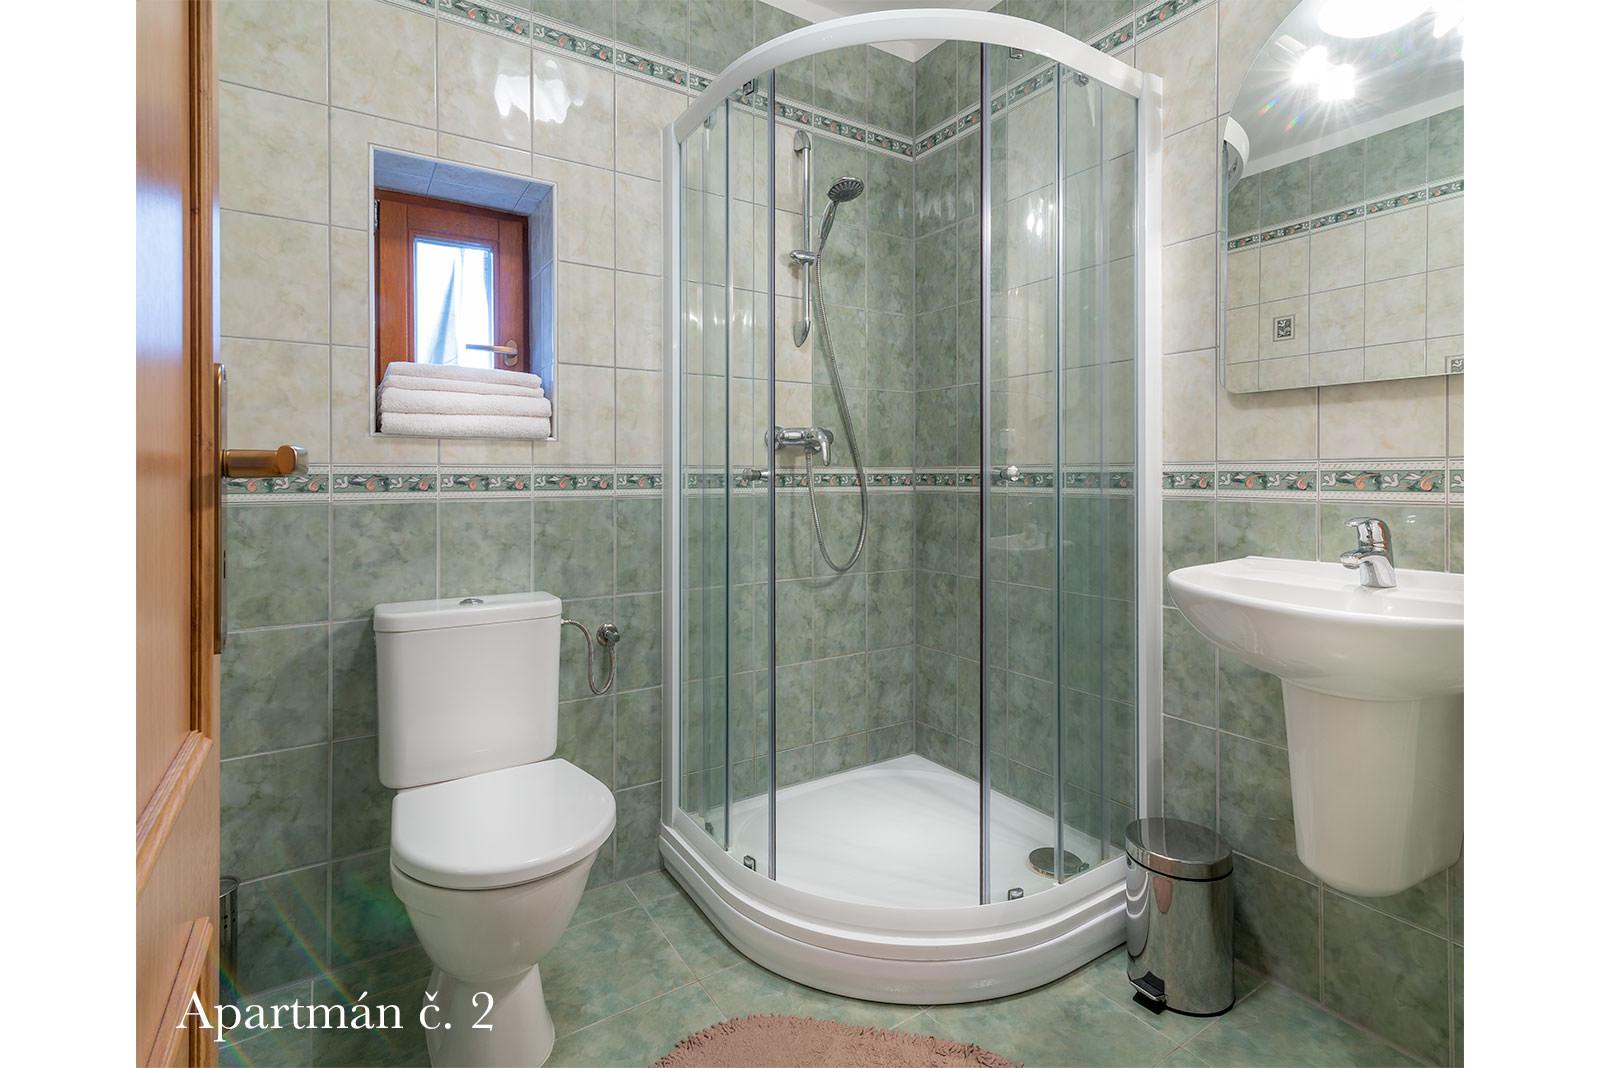 penzion-nad-starym-sklepem-garcicovi-pavlov-apartman-02-01